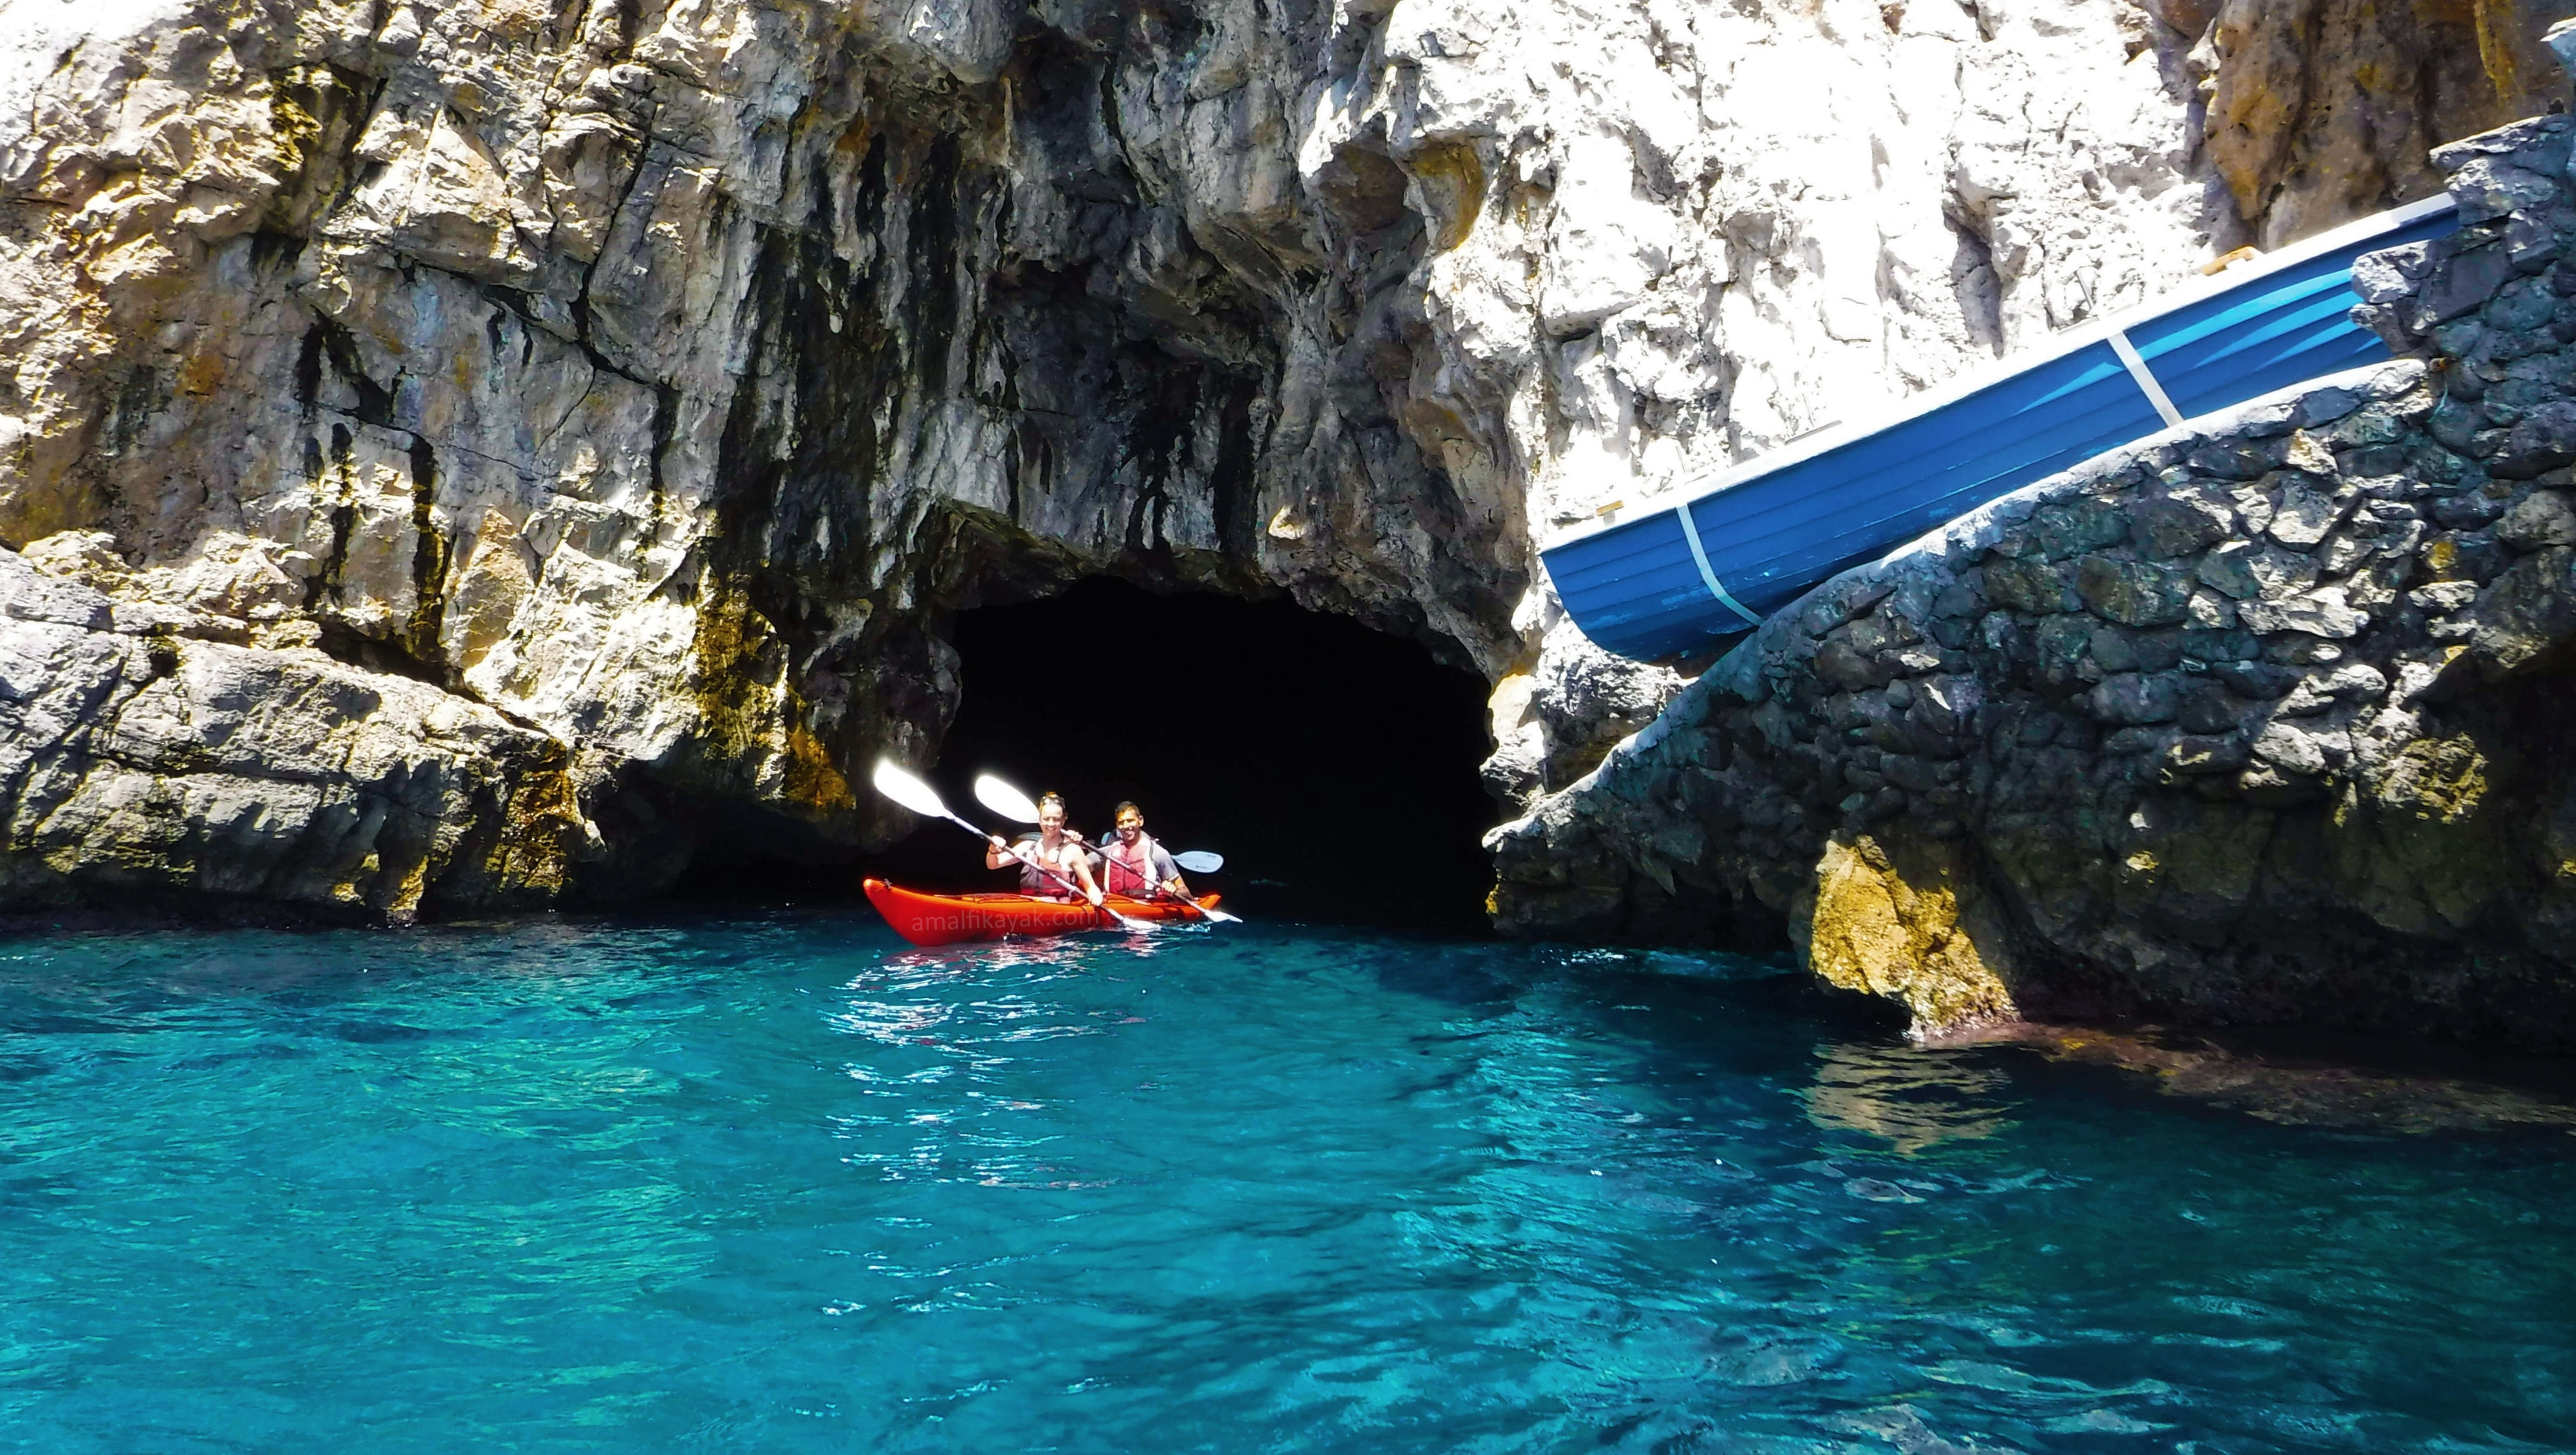 Africana Grotto - Amalfi Kayak,Italy